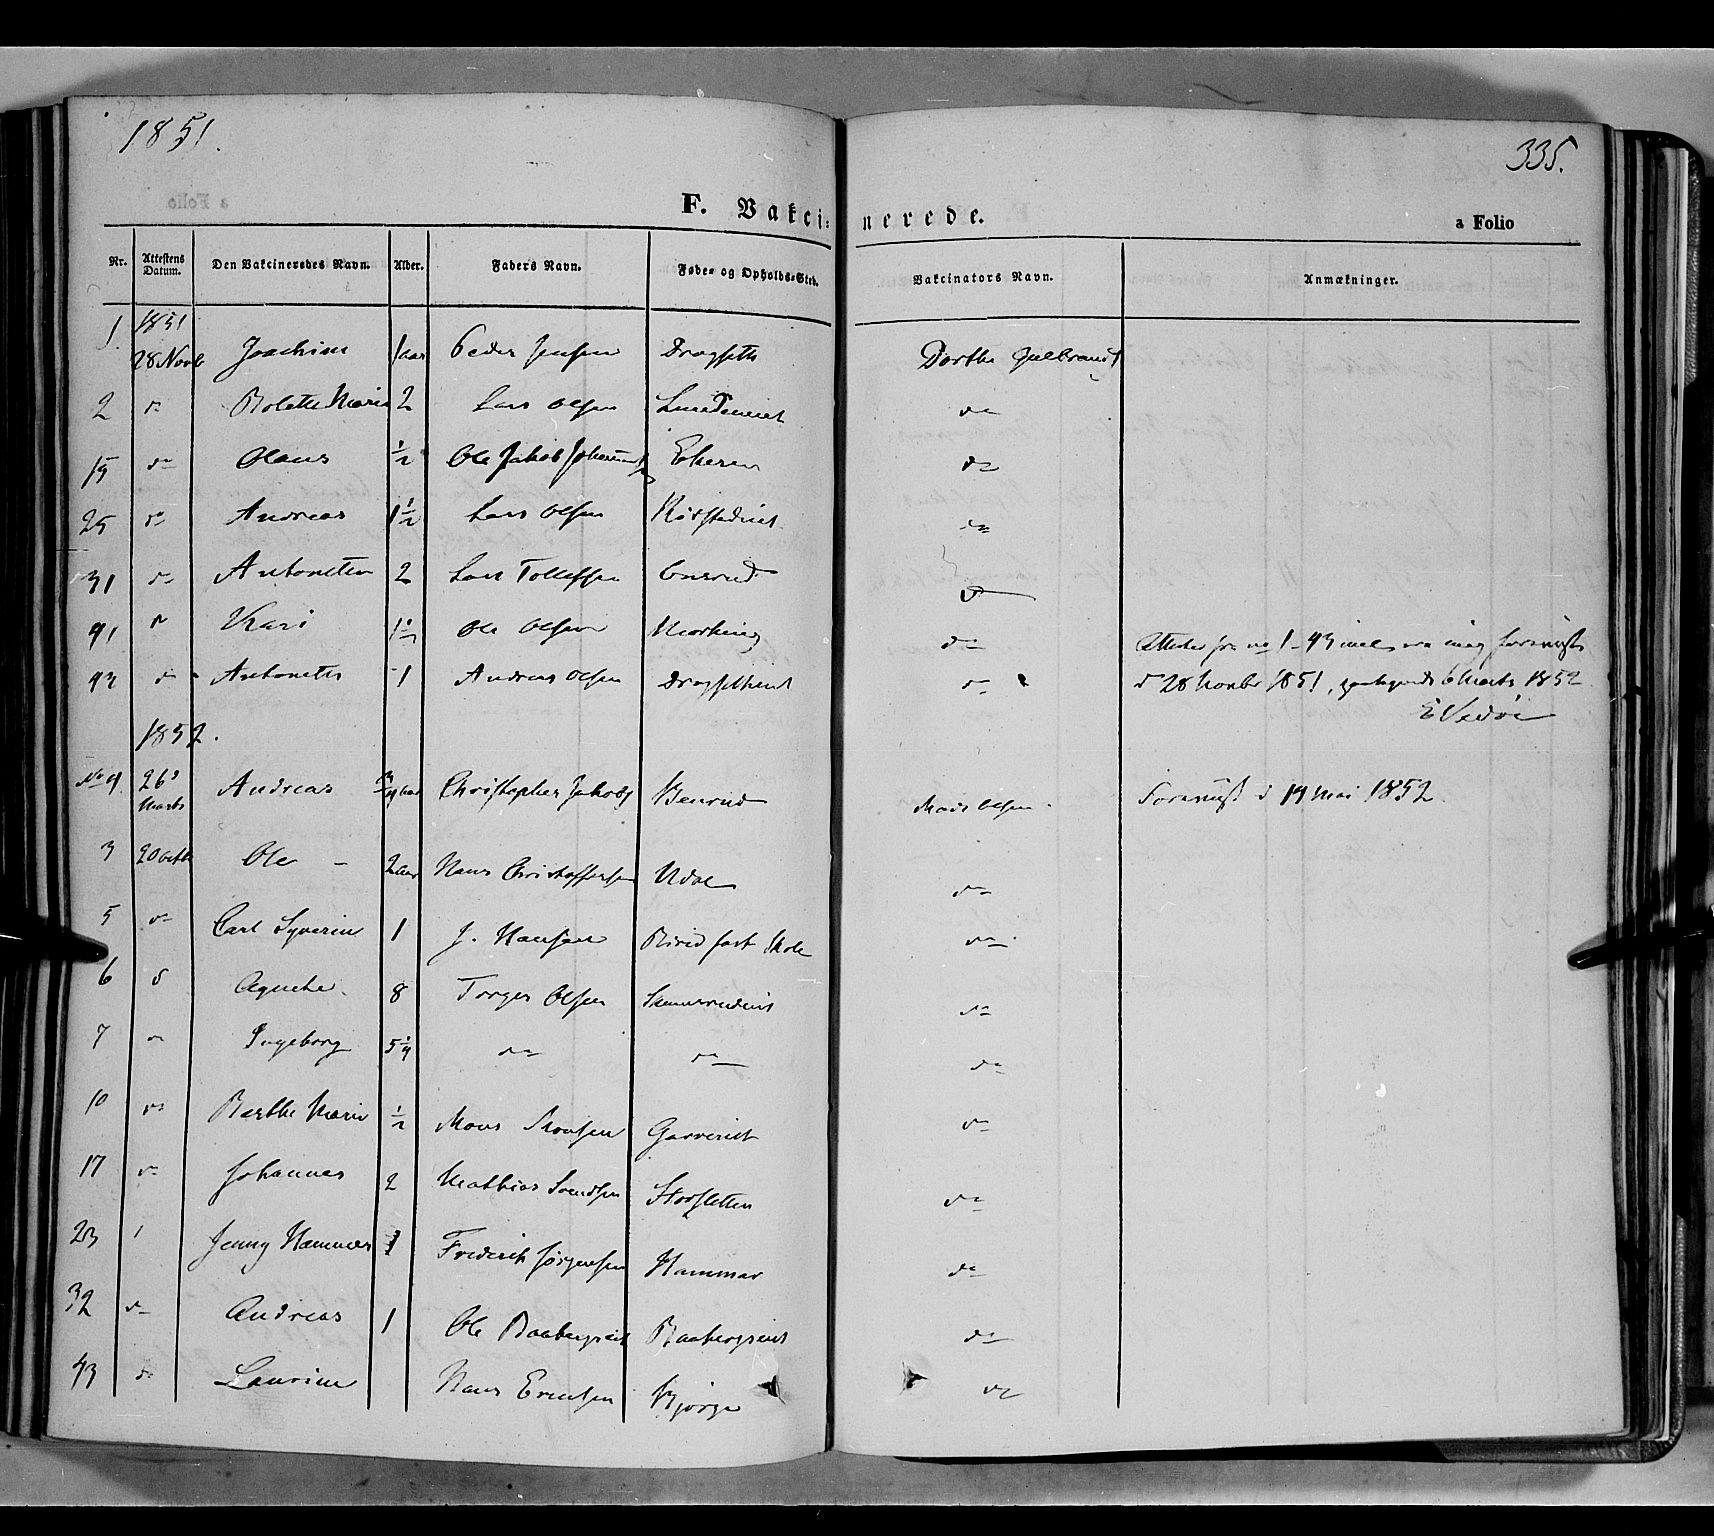 SAH, Biri prestekontor, Ministerialbok nr. 5, 1843-1854, s. 335